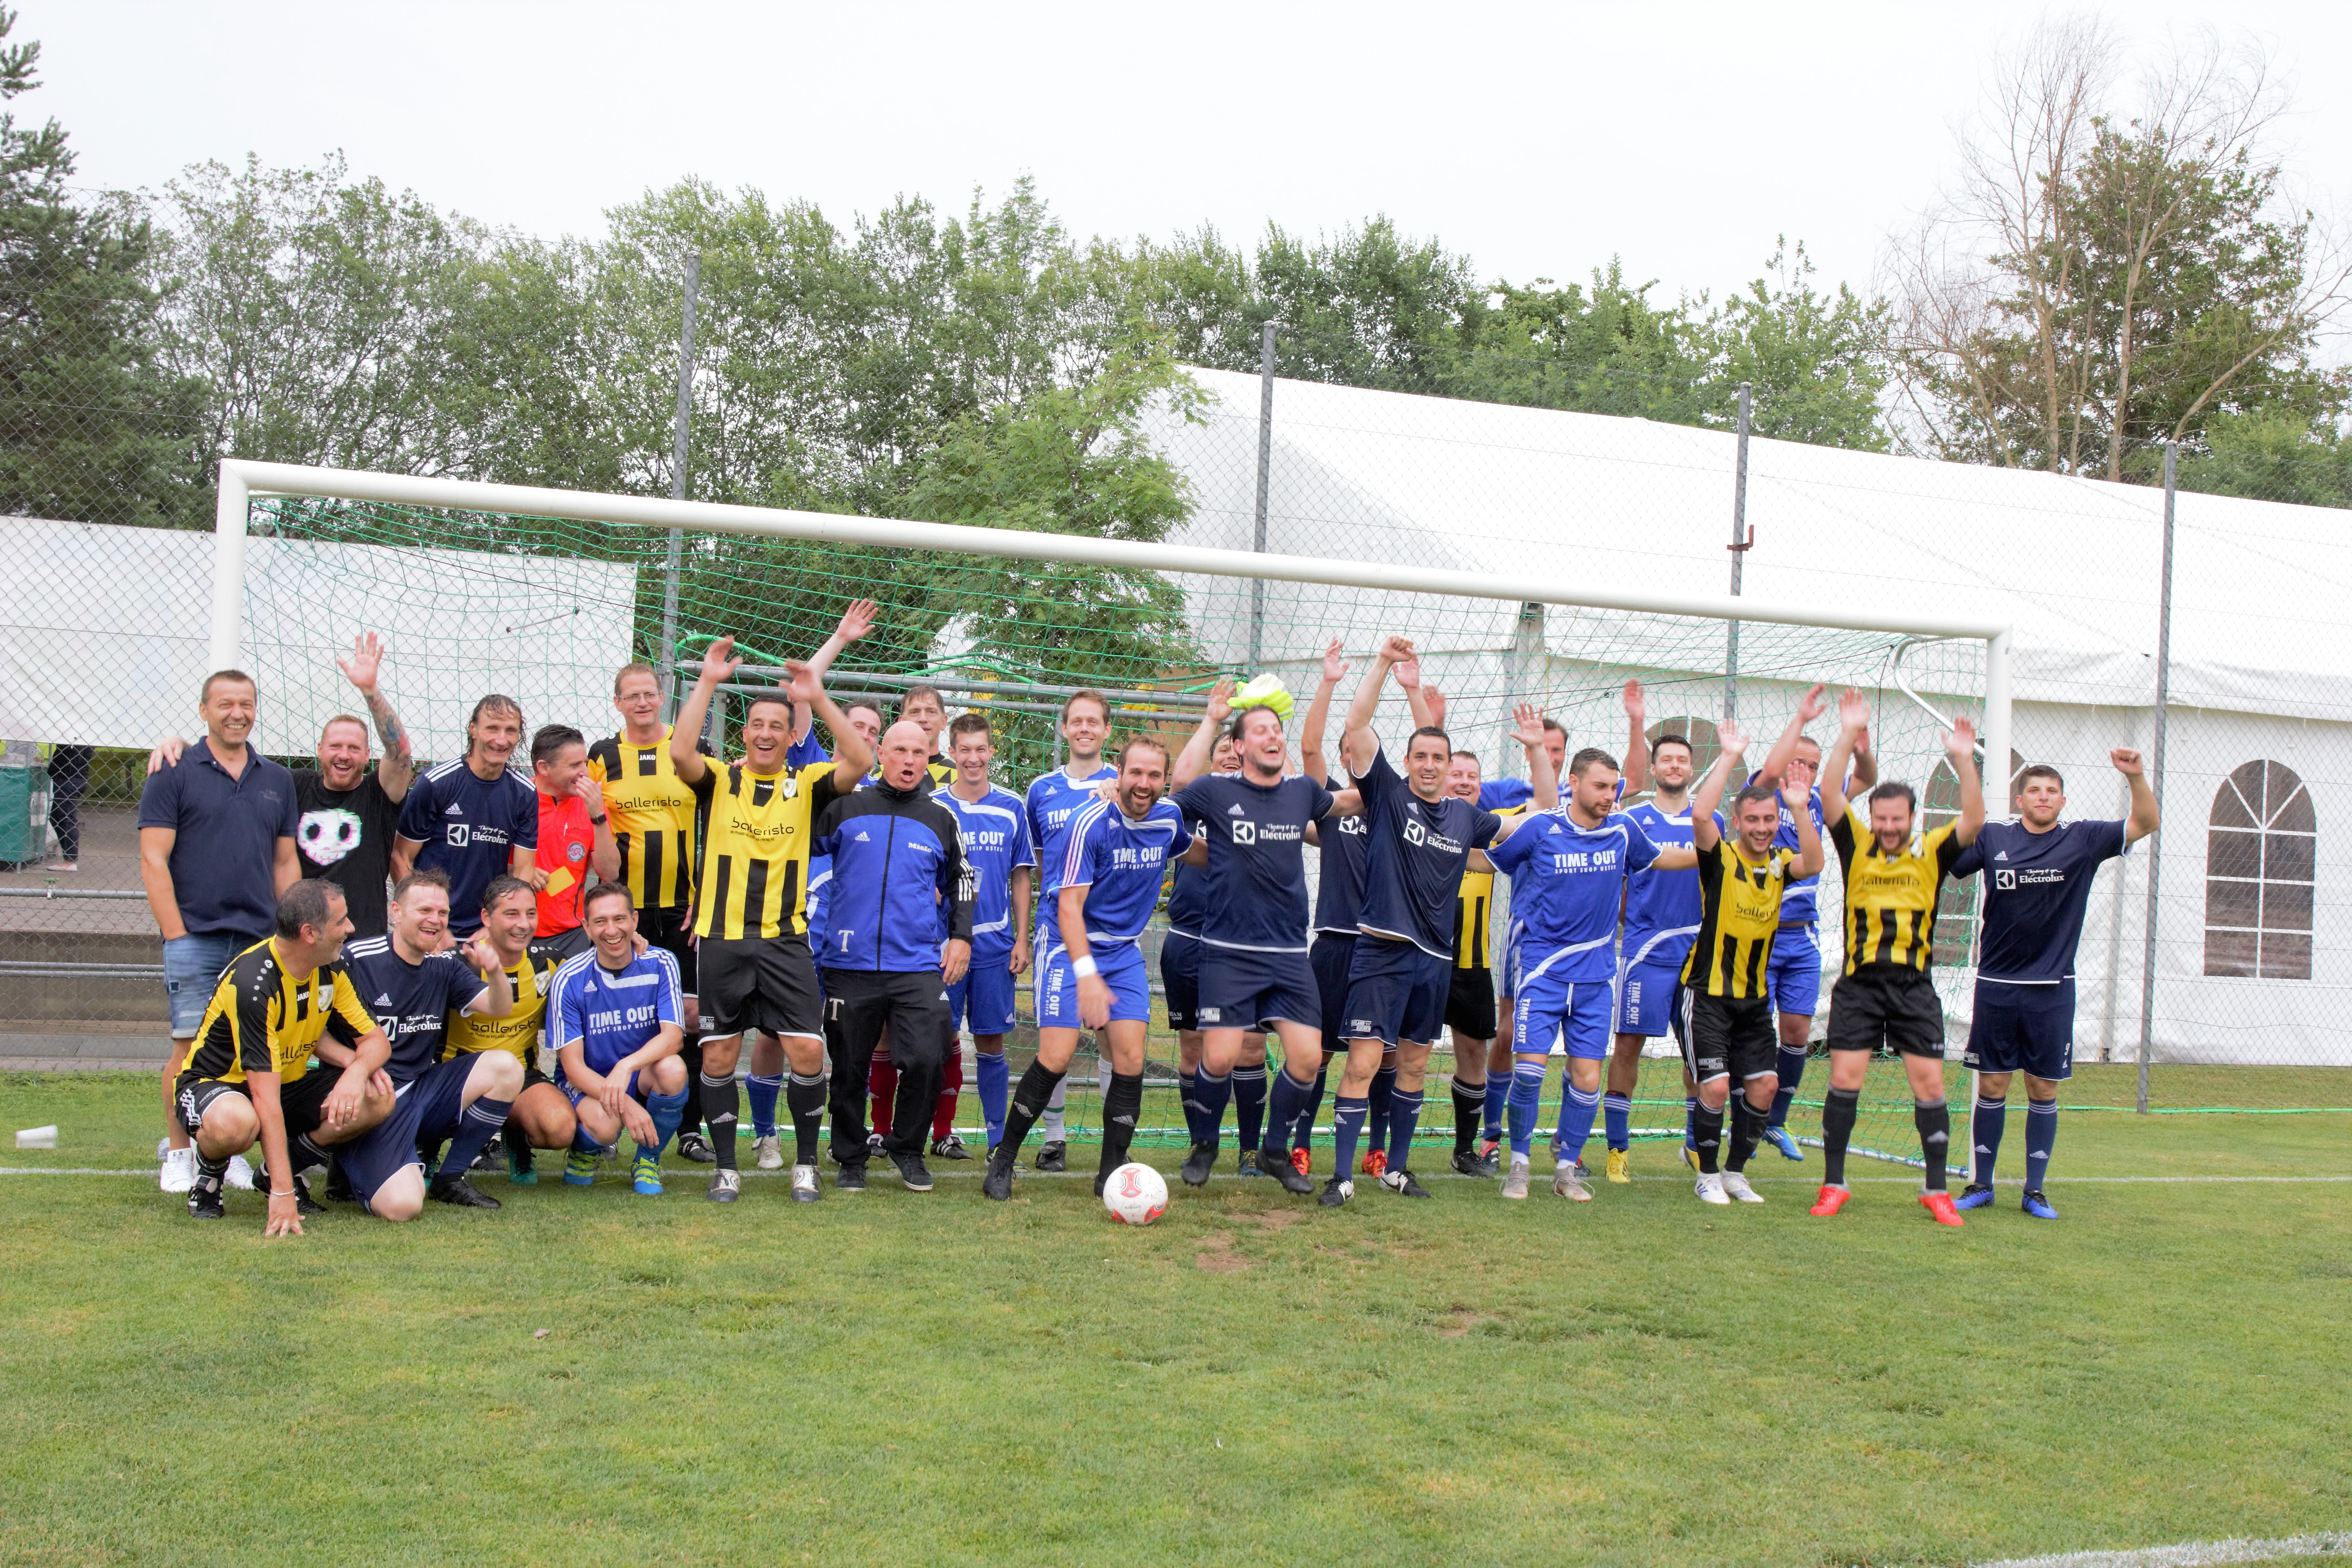 50 Jahre FC Russikon - Jubiläum 6. Juli 2019